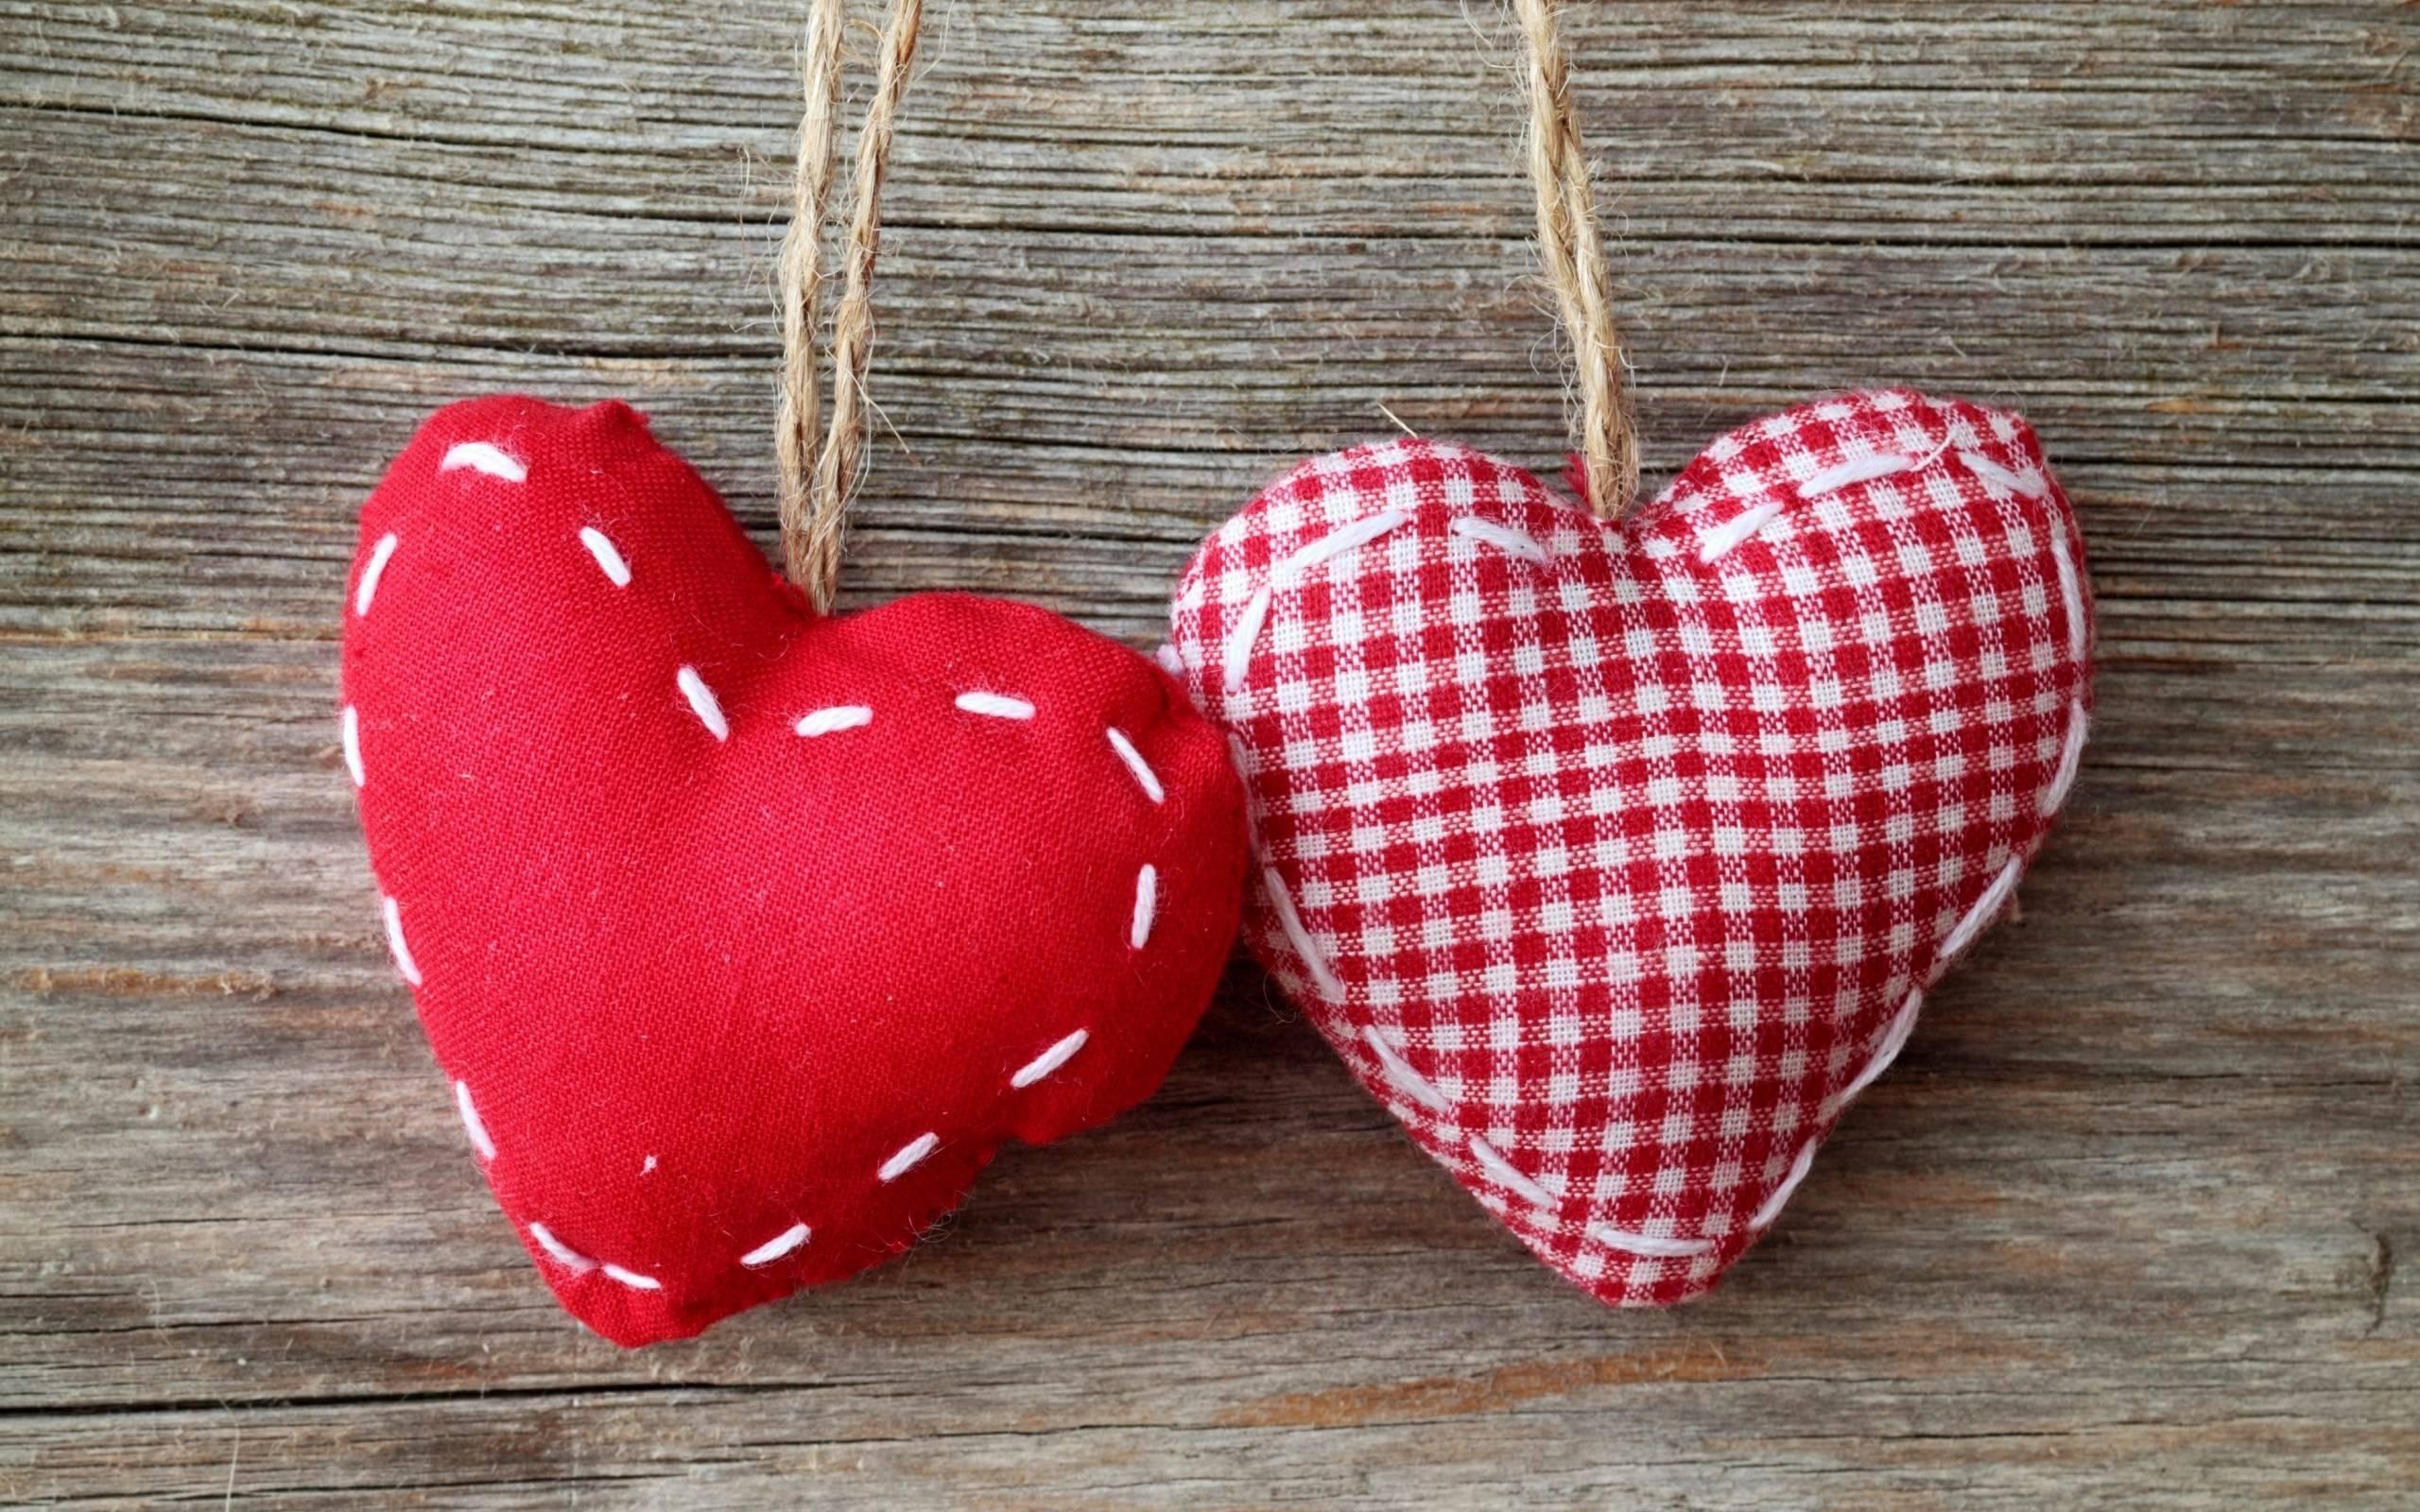 Hearts Love HD Wallpaper - FreeHDWalls